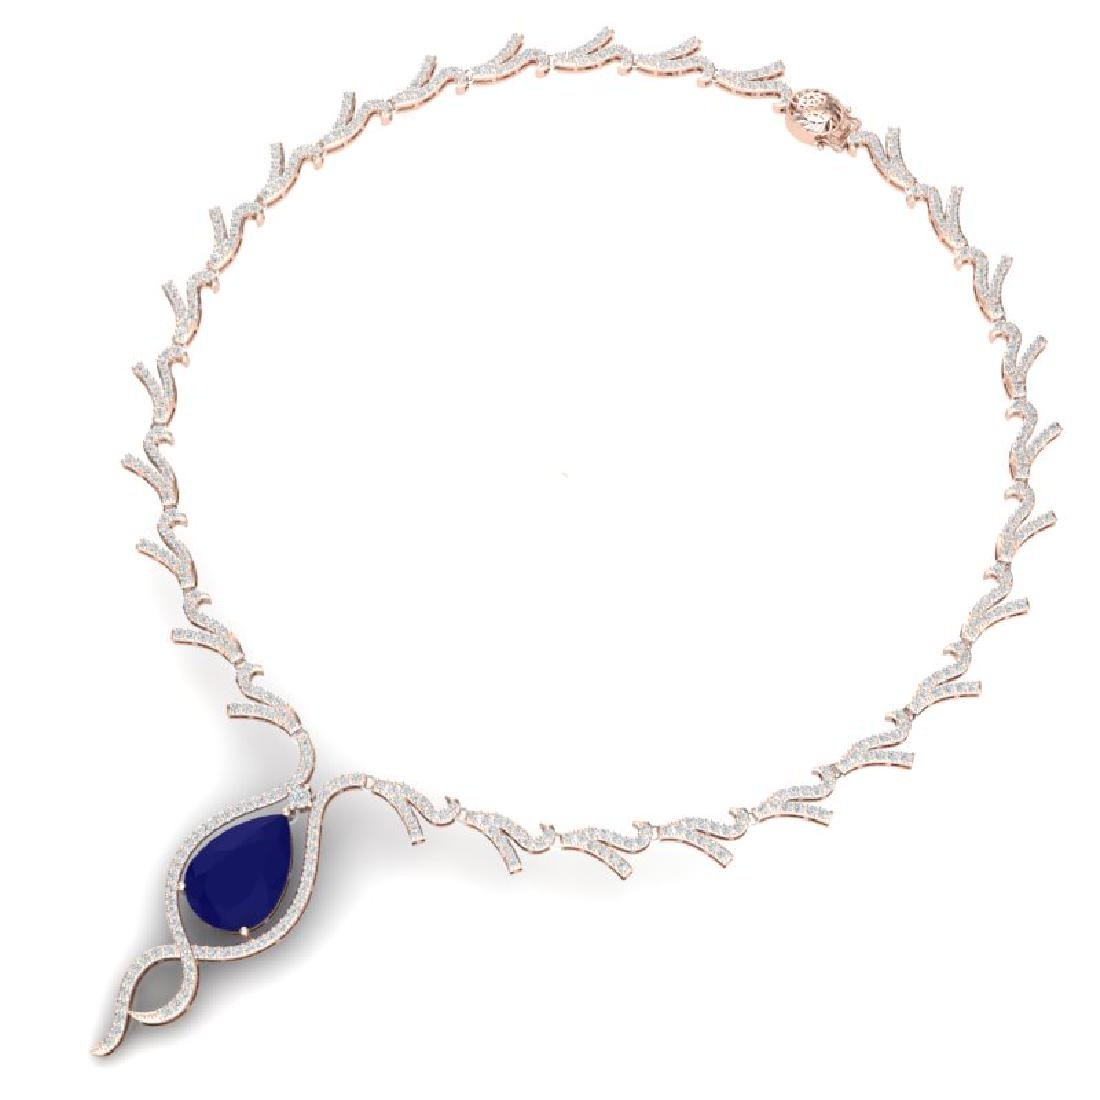 23.43 CTW Royalty Sapphire & VS Diamond Necklace 18K - 2